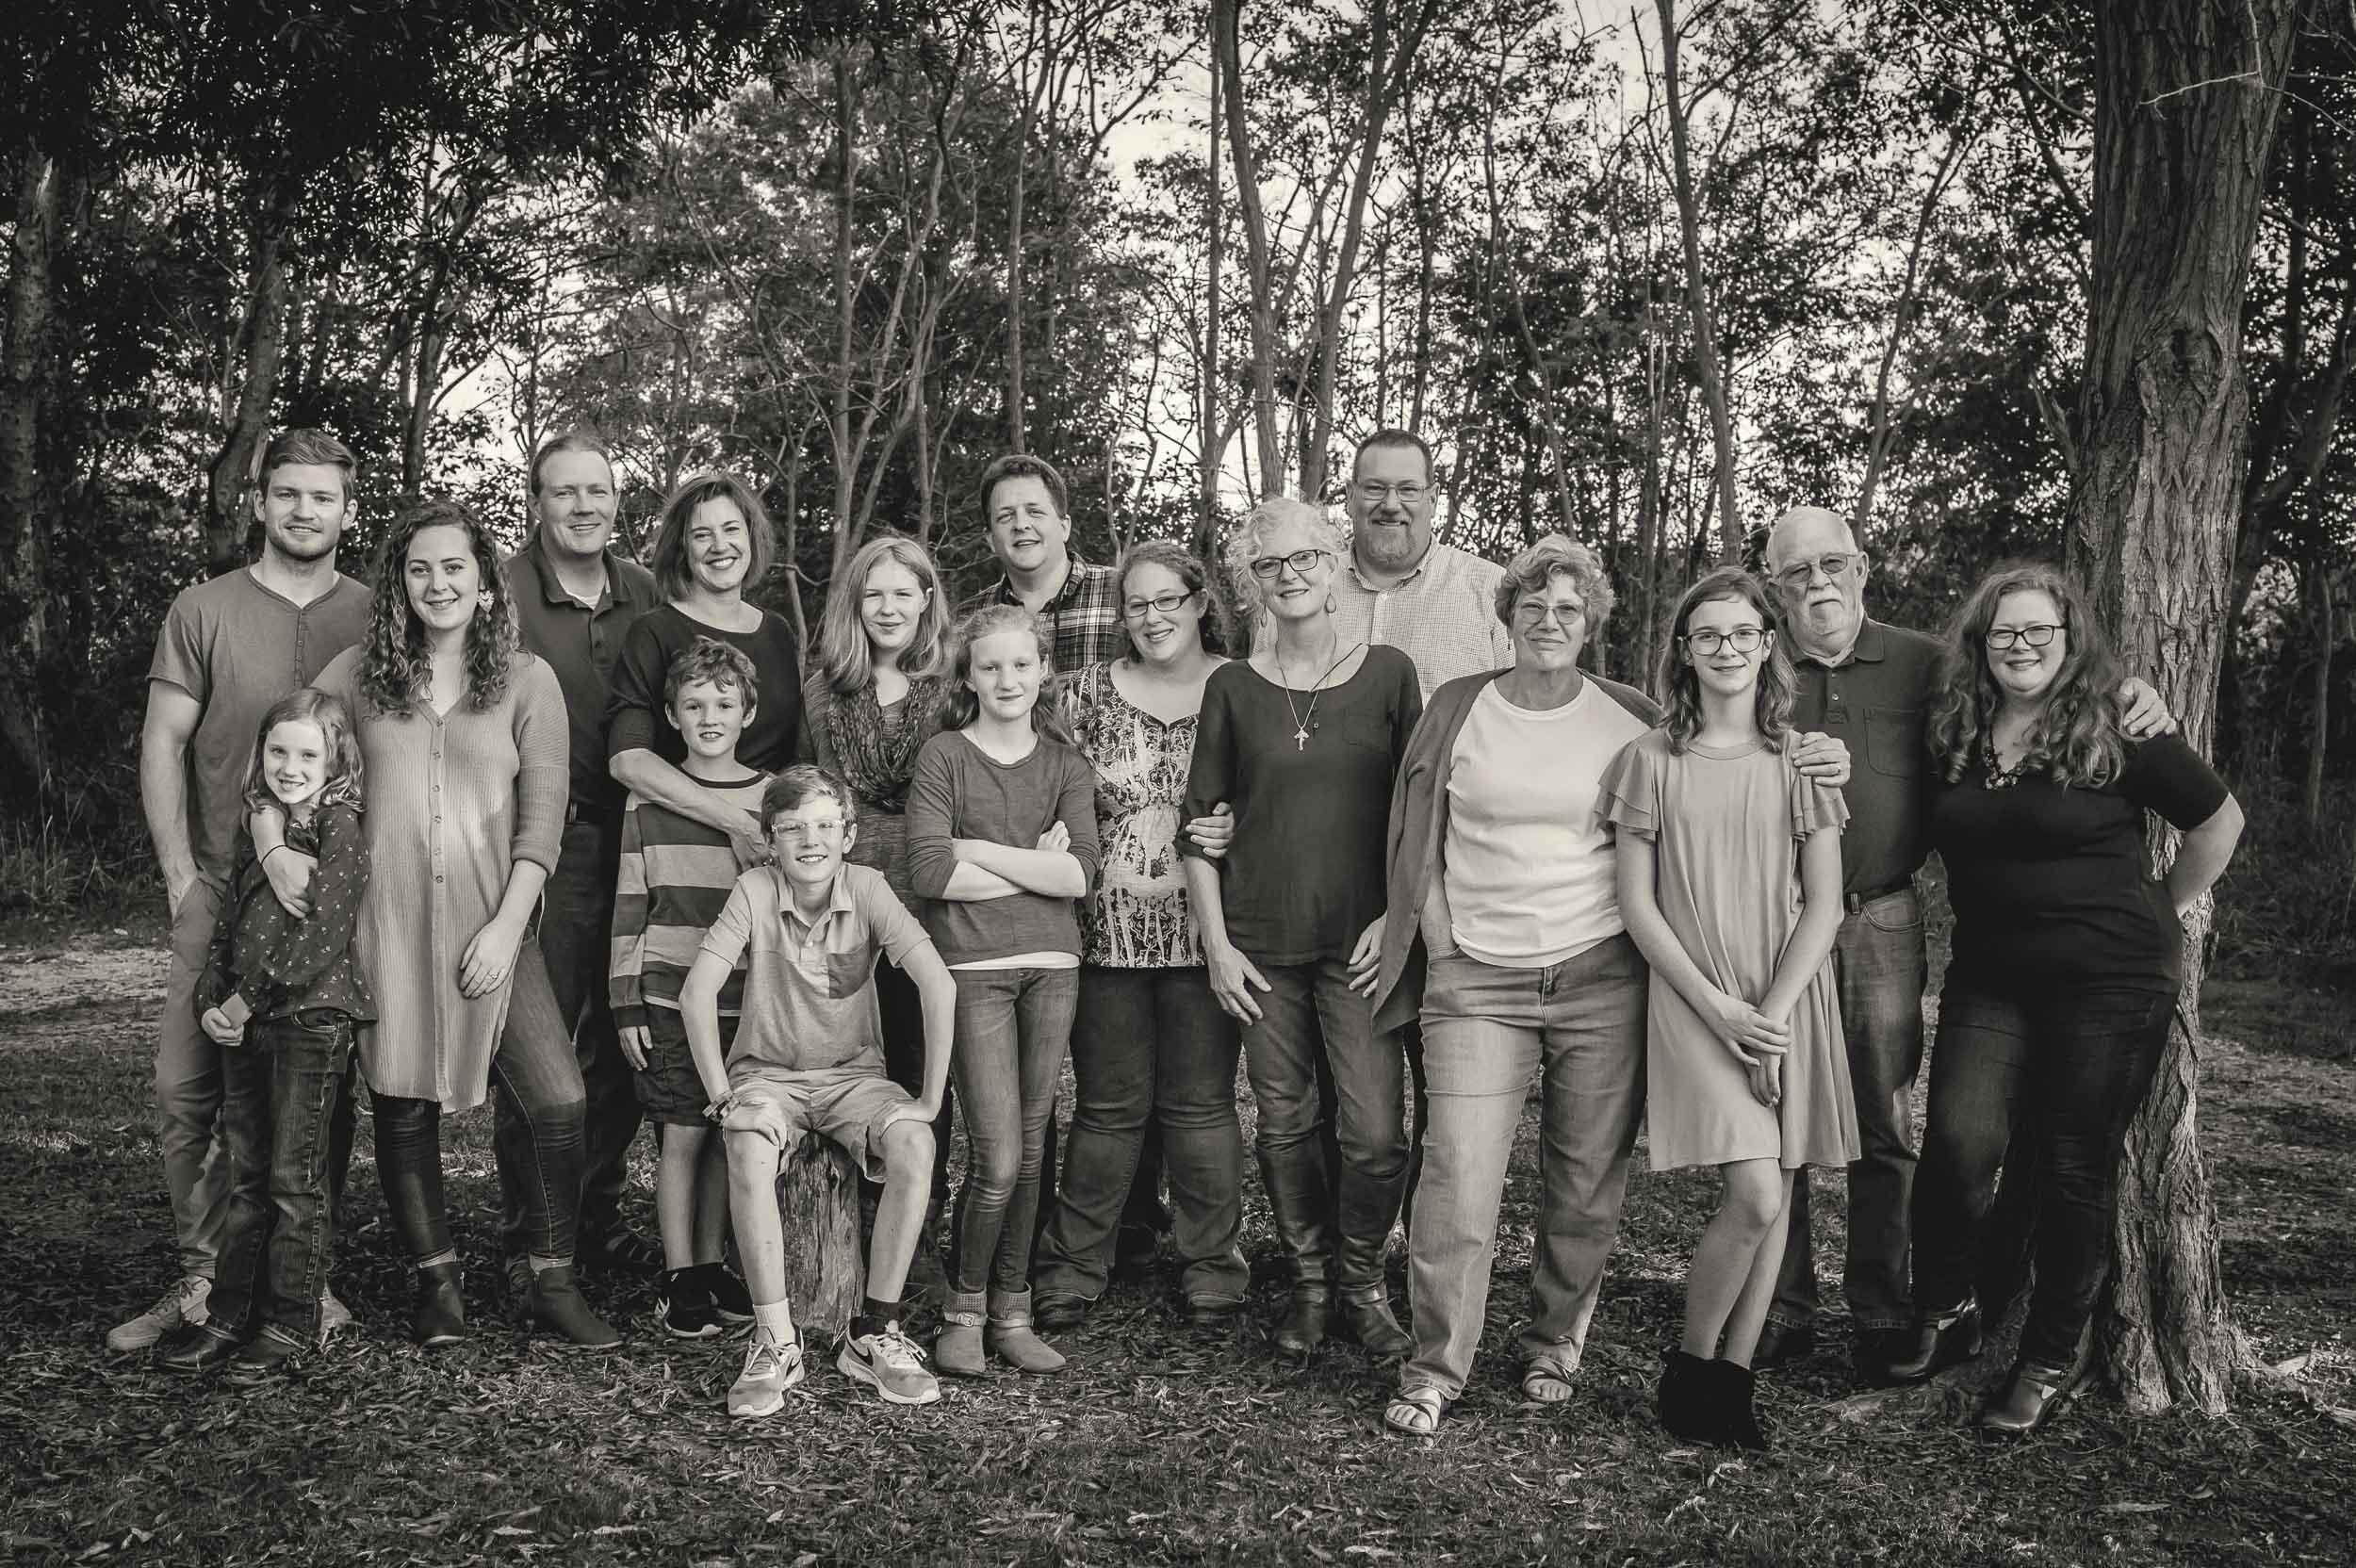 Family_Senior_Wedding_Maryland_Photographer_Sonny_and_Allison_Favorites_Easton_Crofton_Oxford-73.jpg